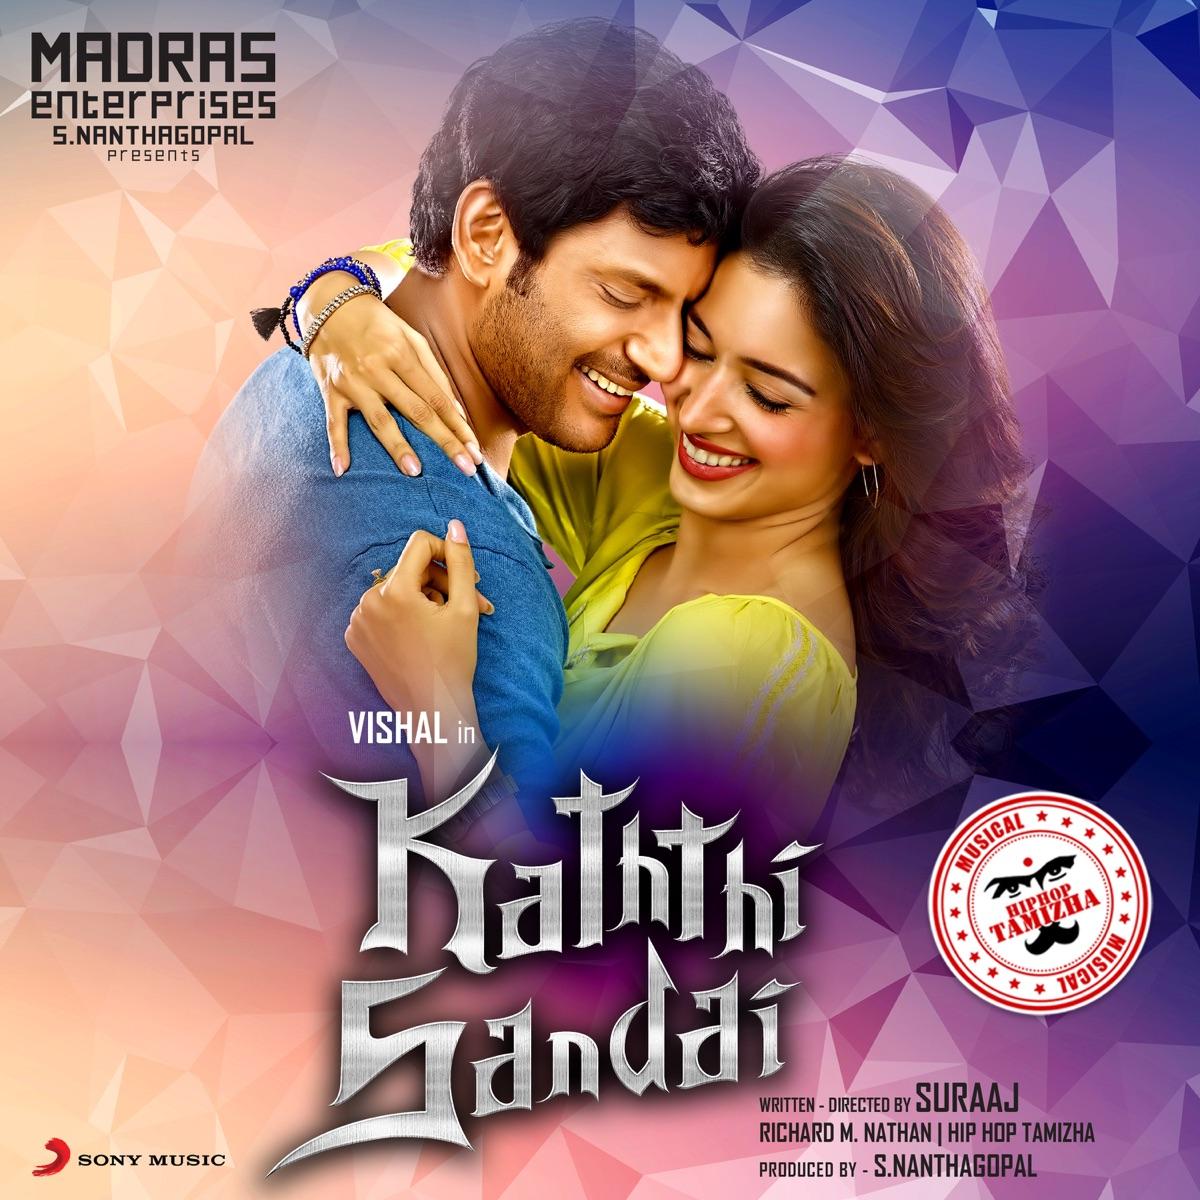 kaththi sandai album coverhiphop tamizha